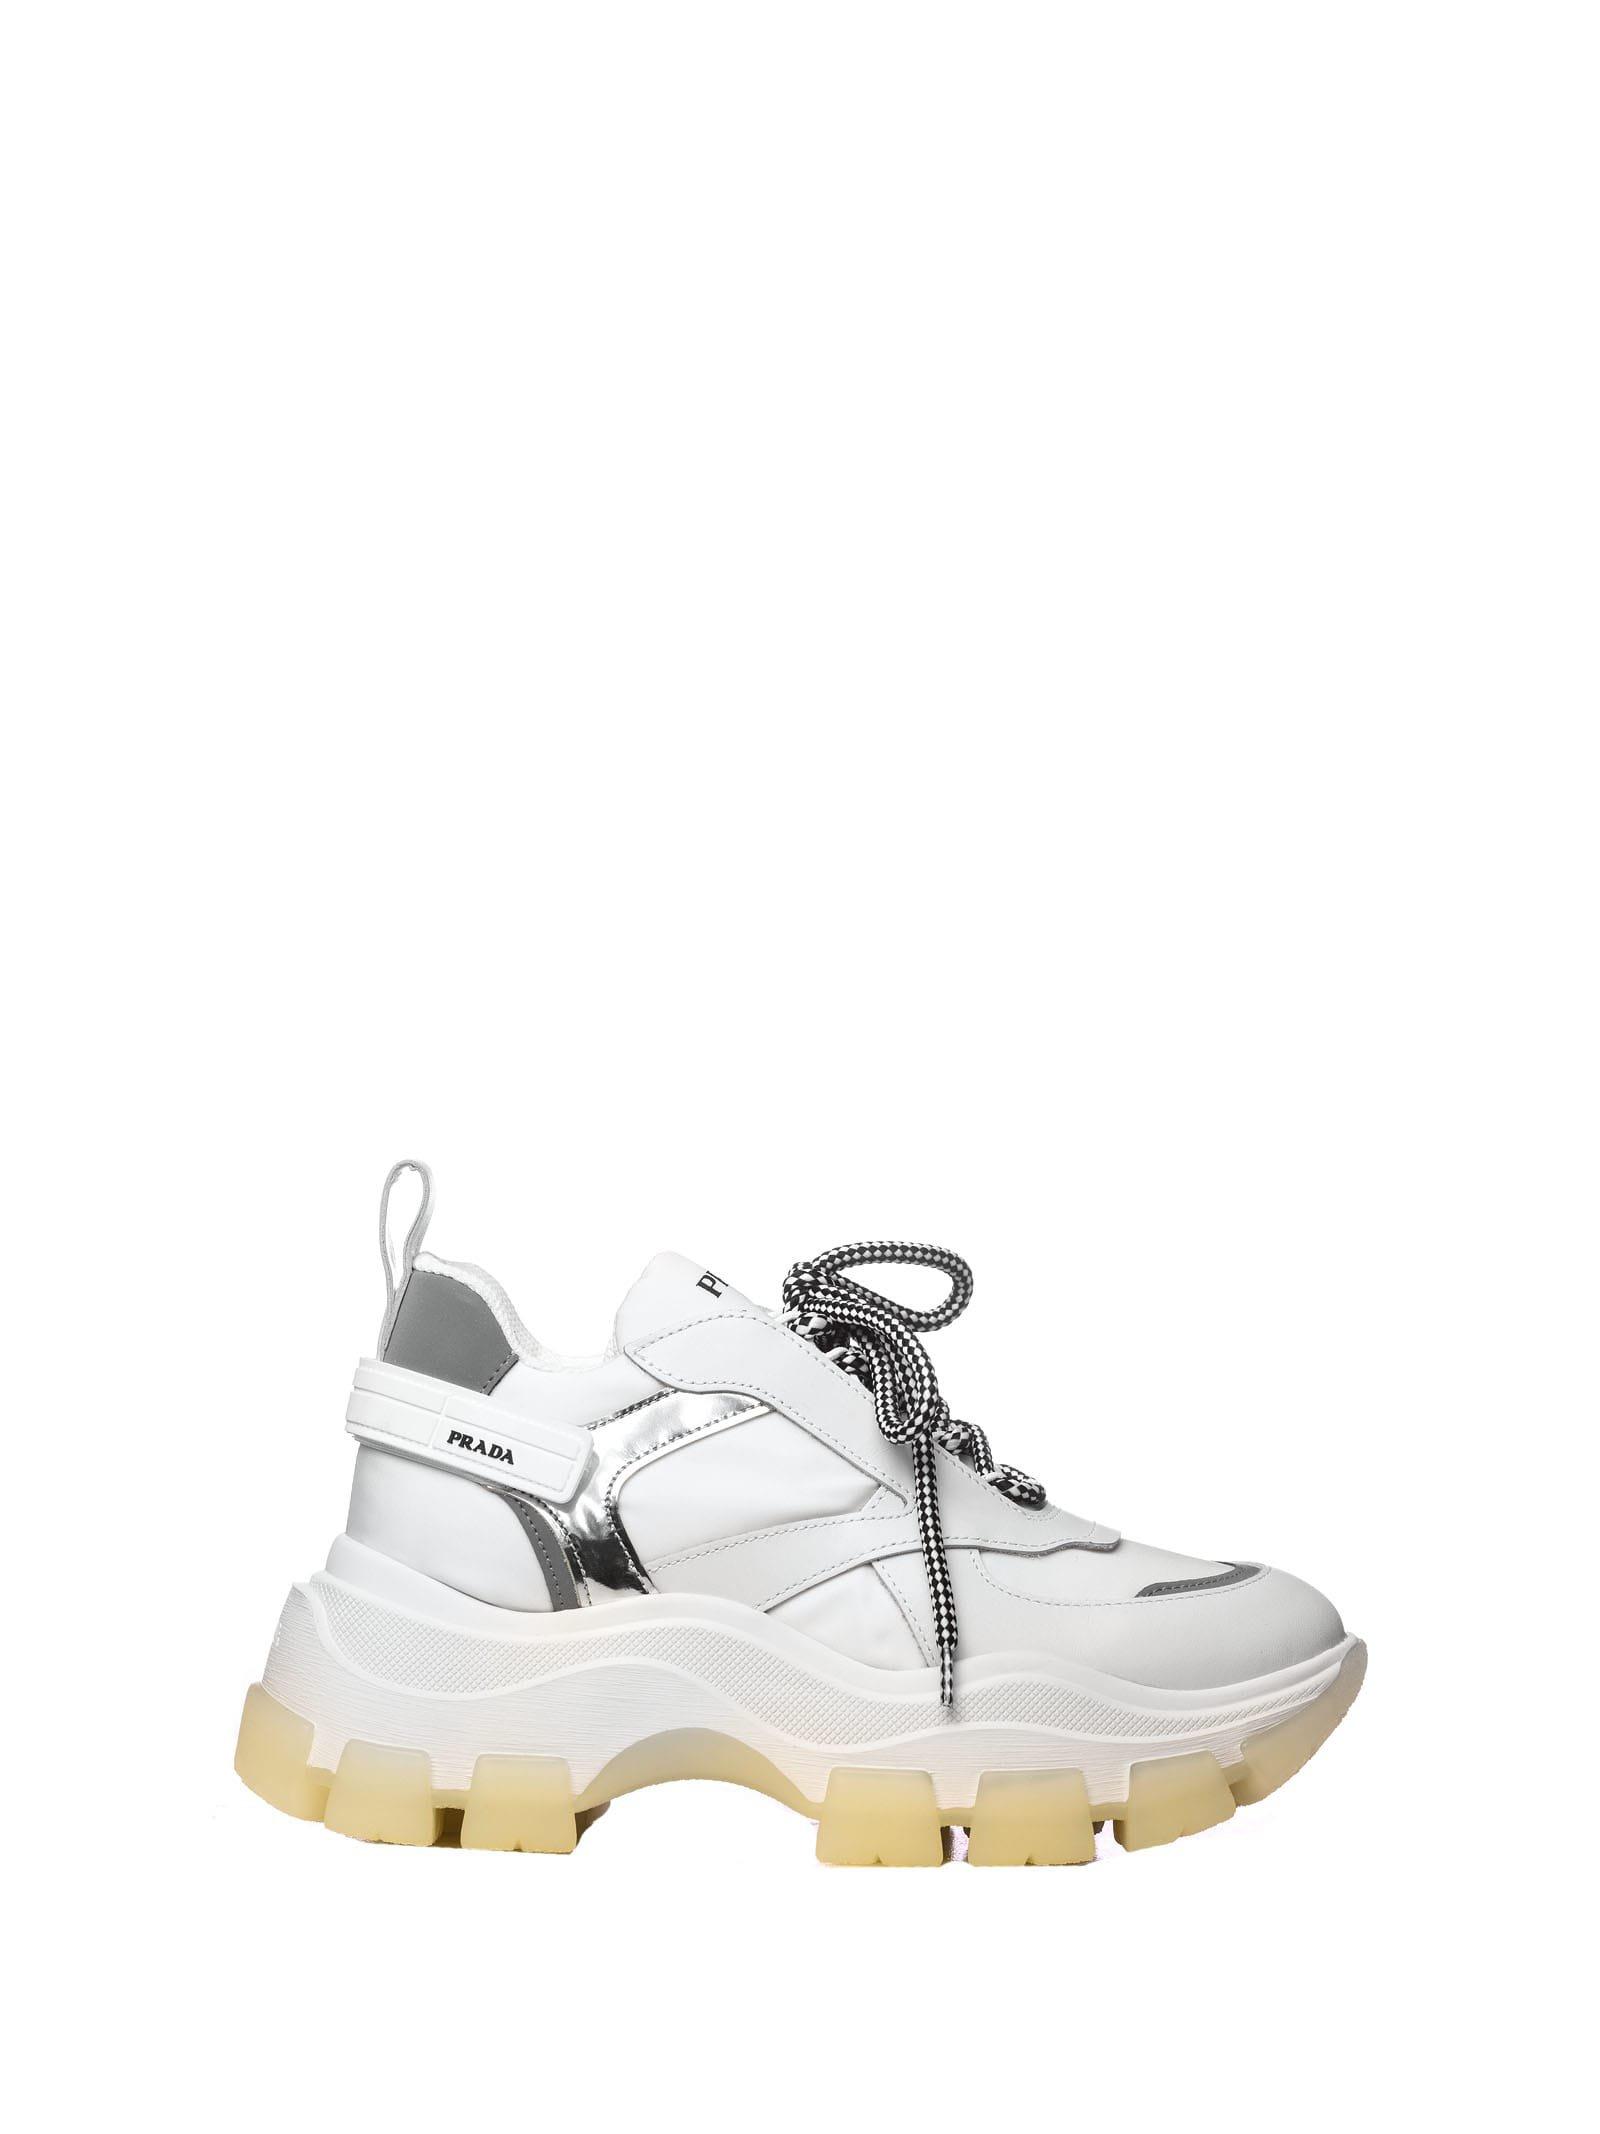 Prada Prada Chunky Sole Sneakers